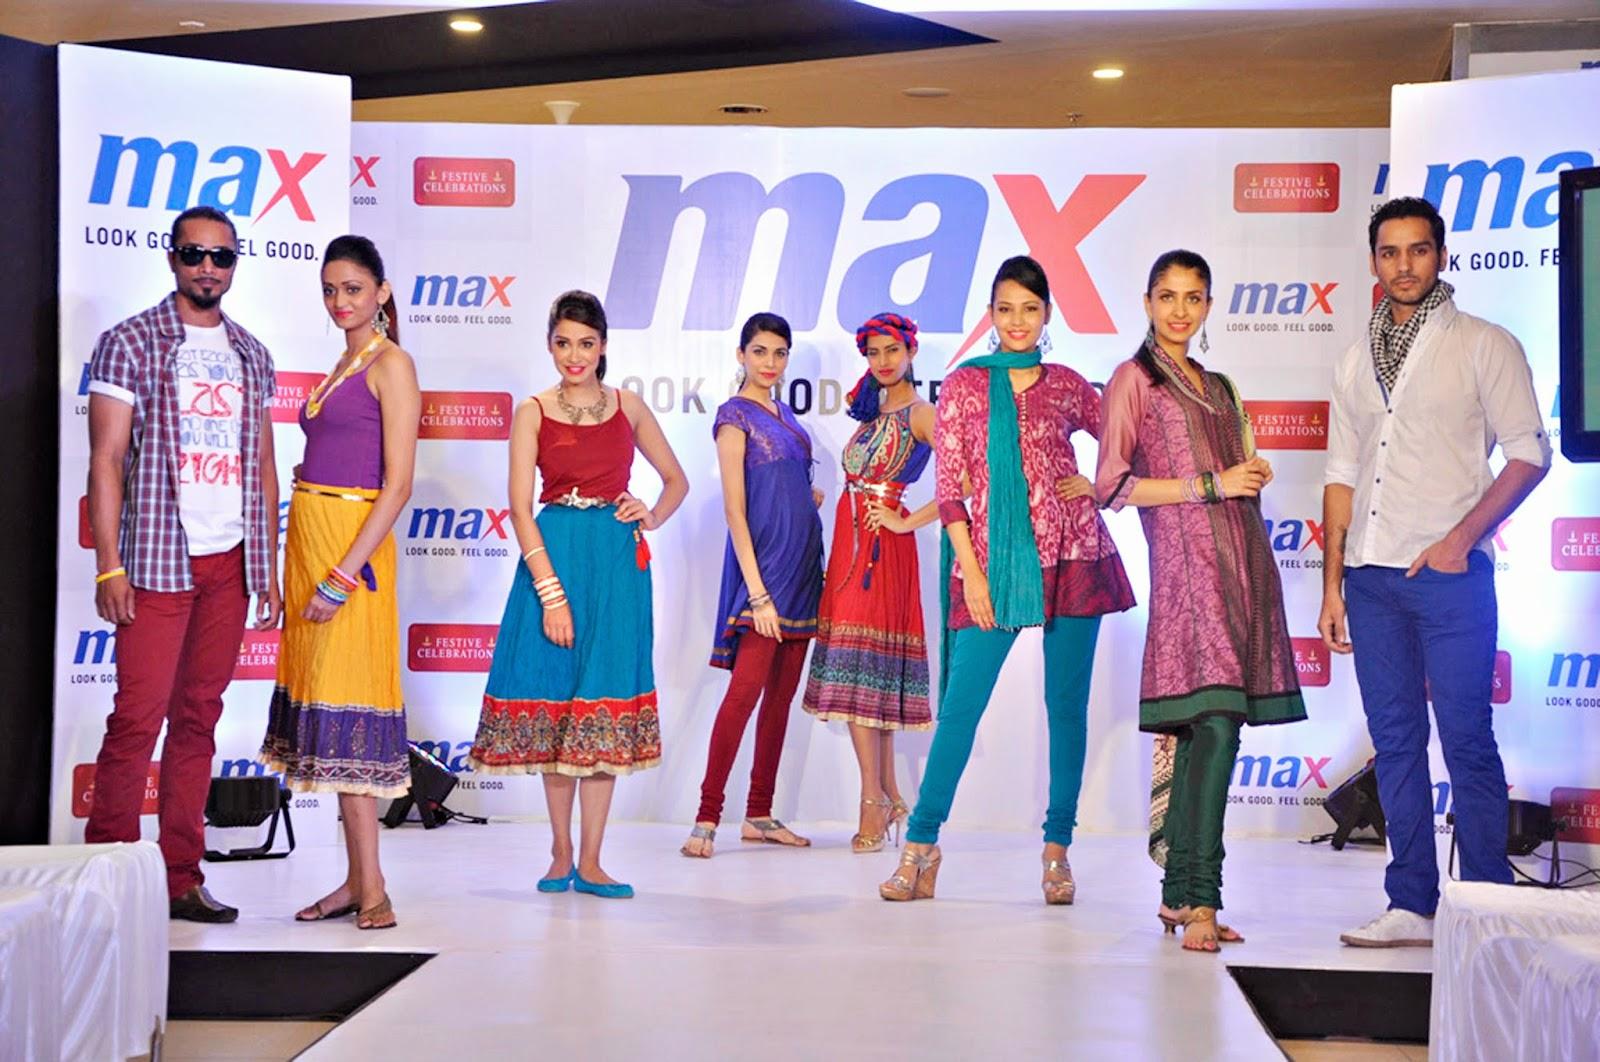 Cj max clothing store